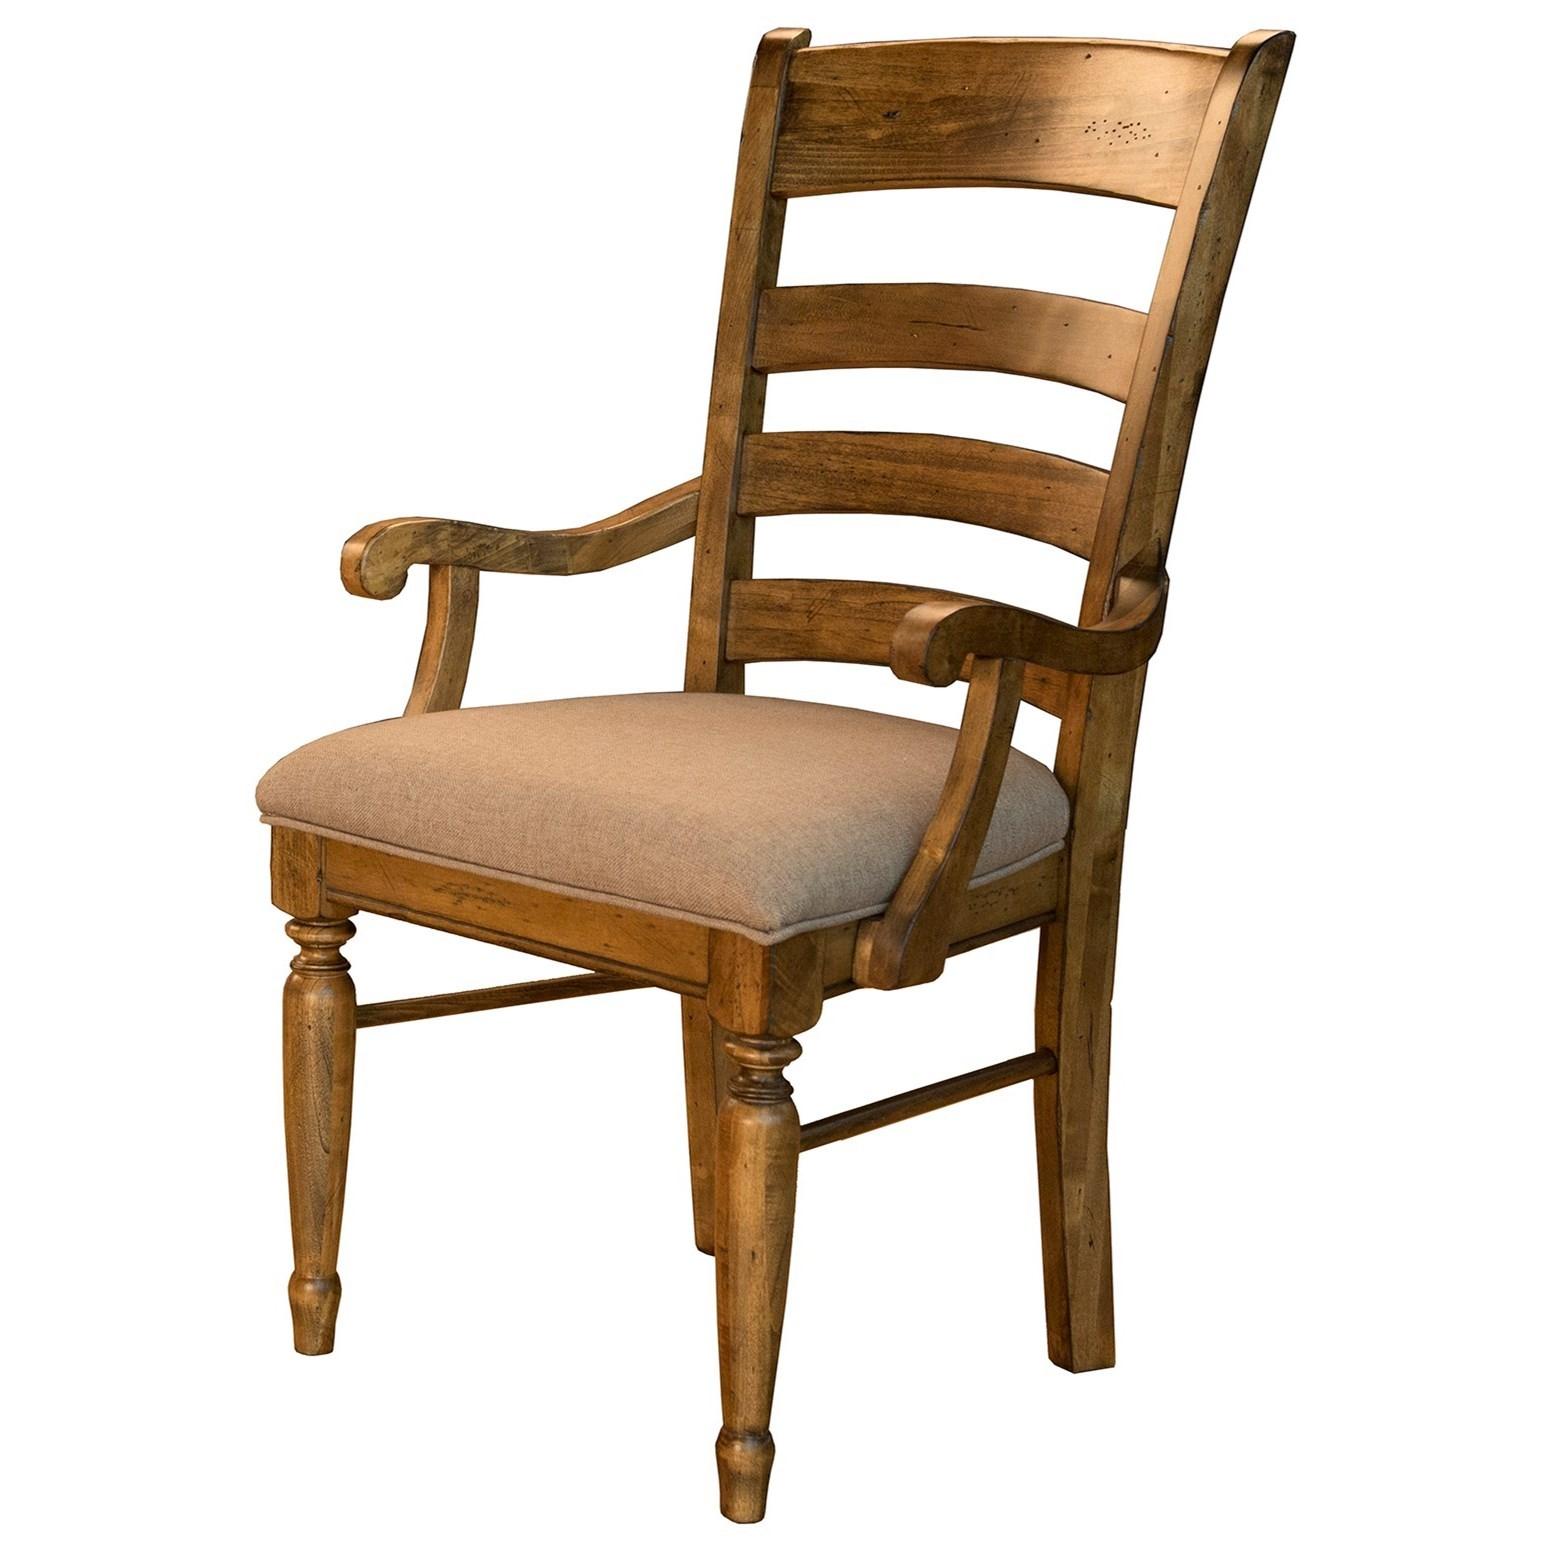 Bennett Ladderback Arm Chair by A-A at Walker's Furniture